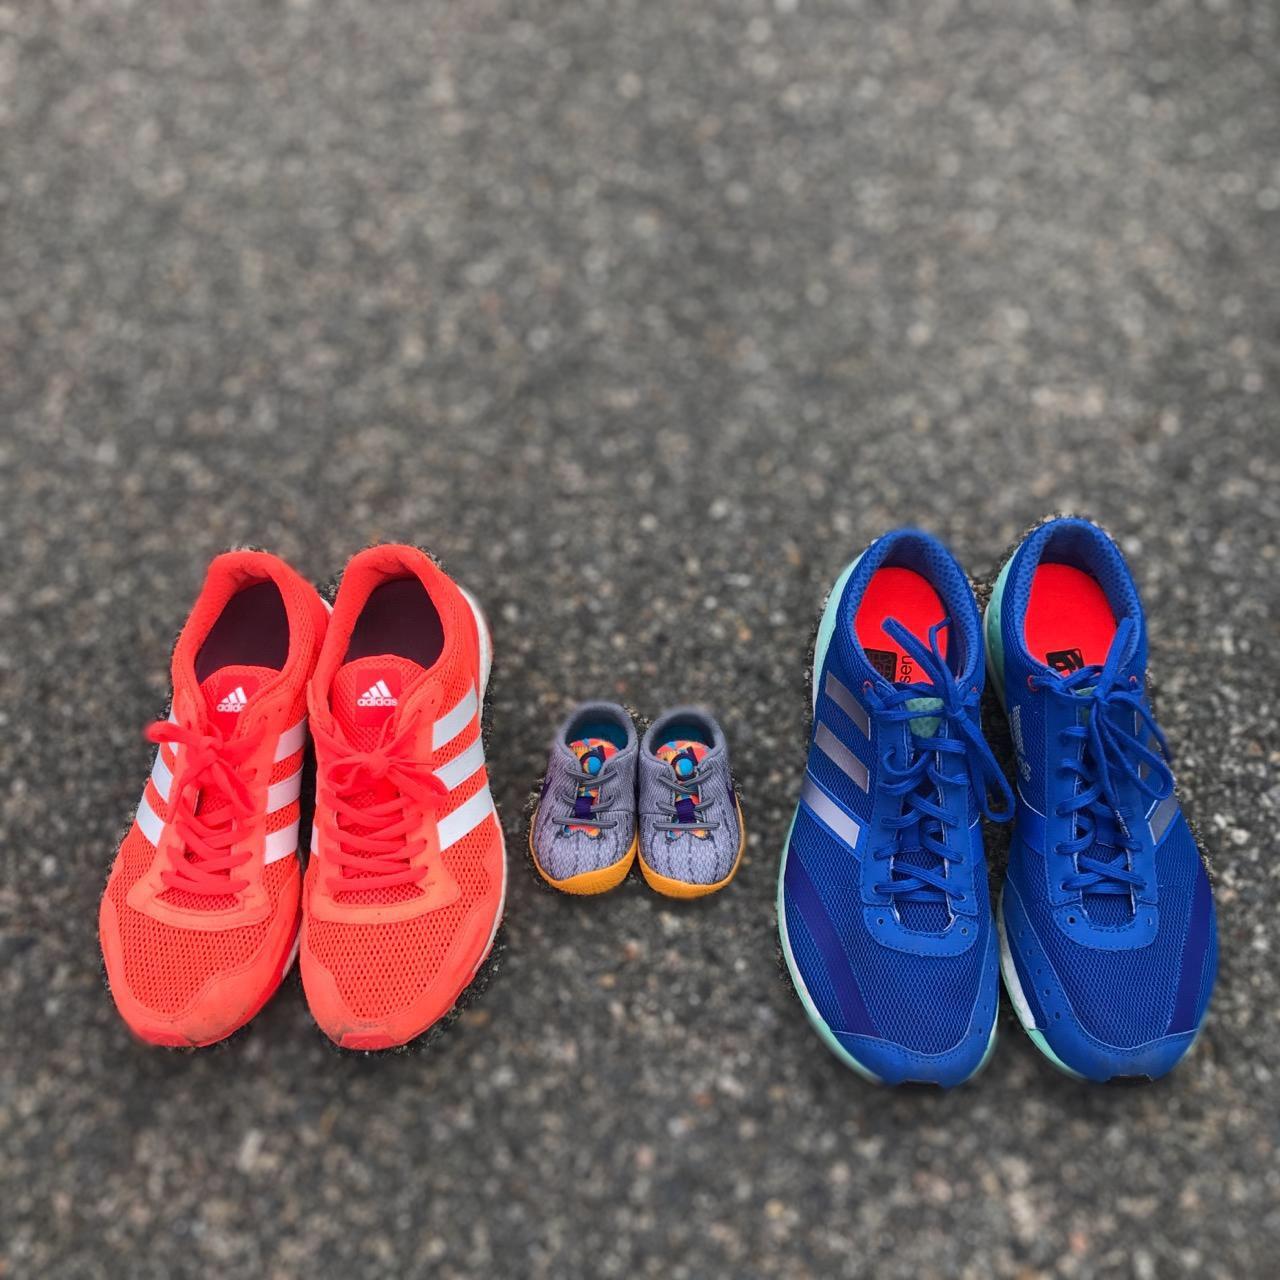 THREE Nurses ran the Boston Marathon in 2017!